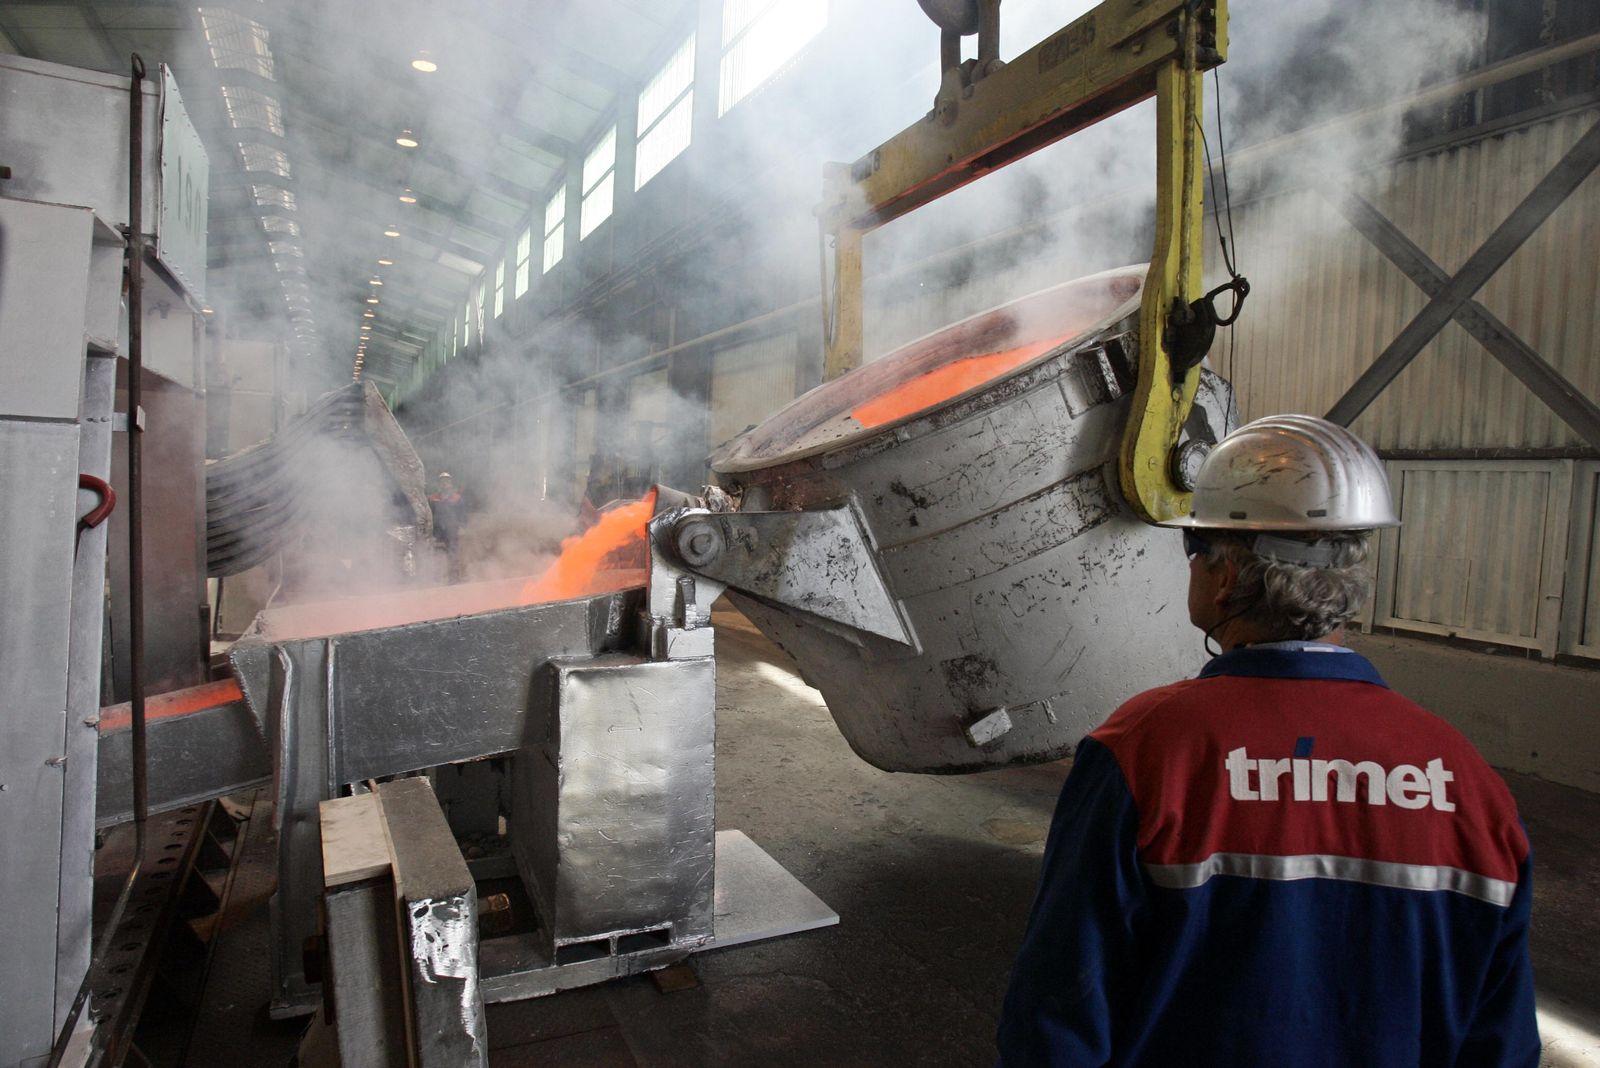 Aluminiumwerk Trimet